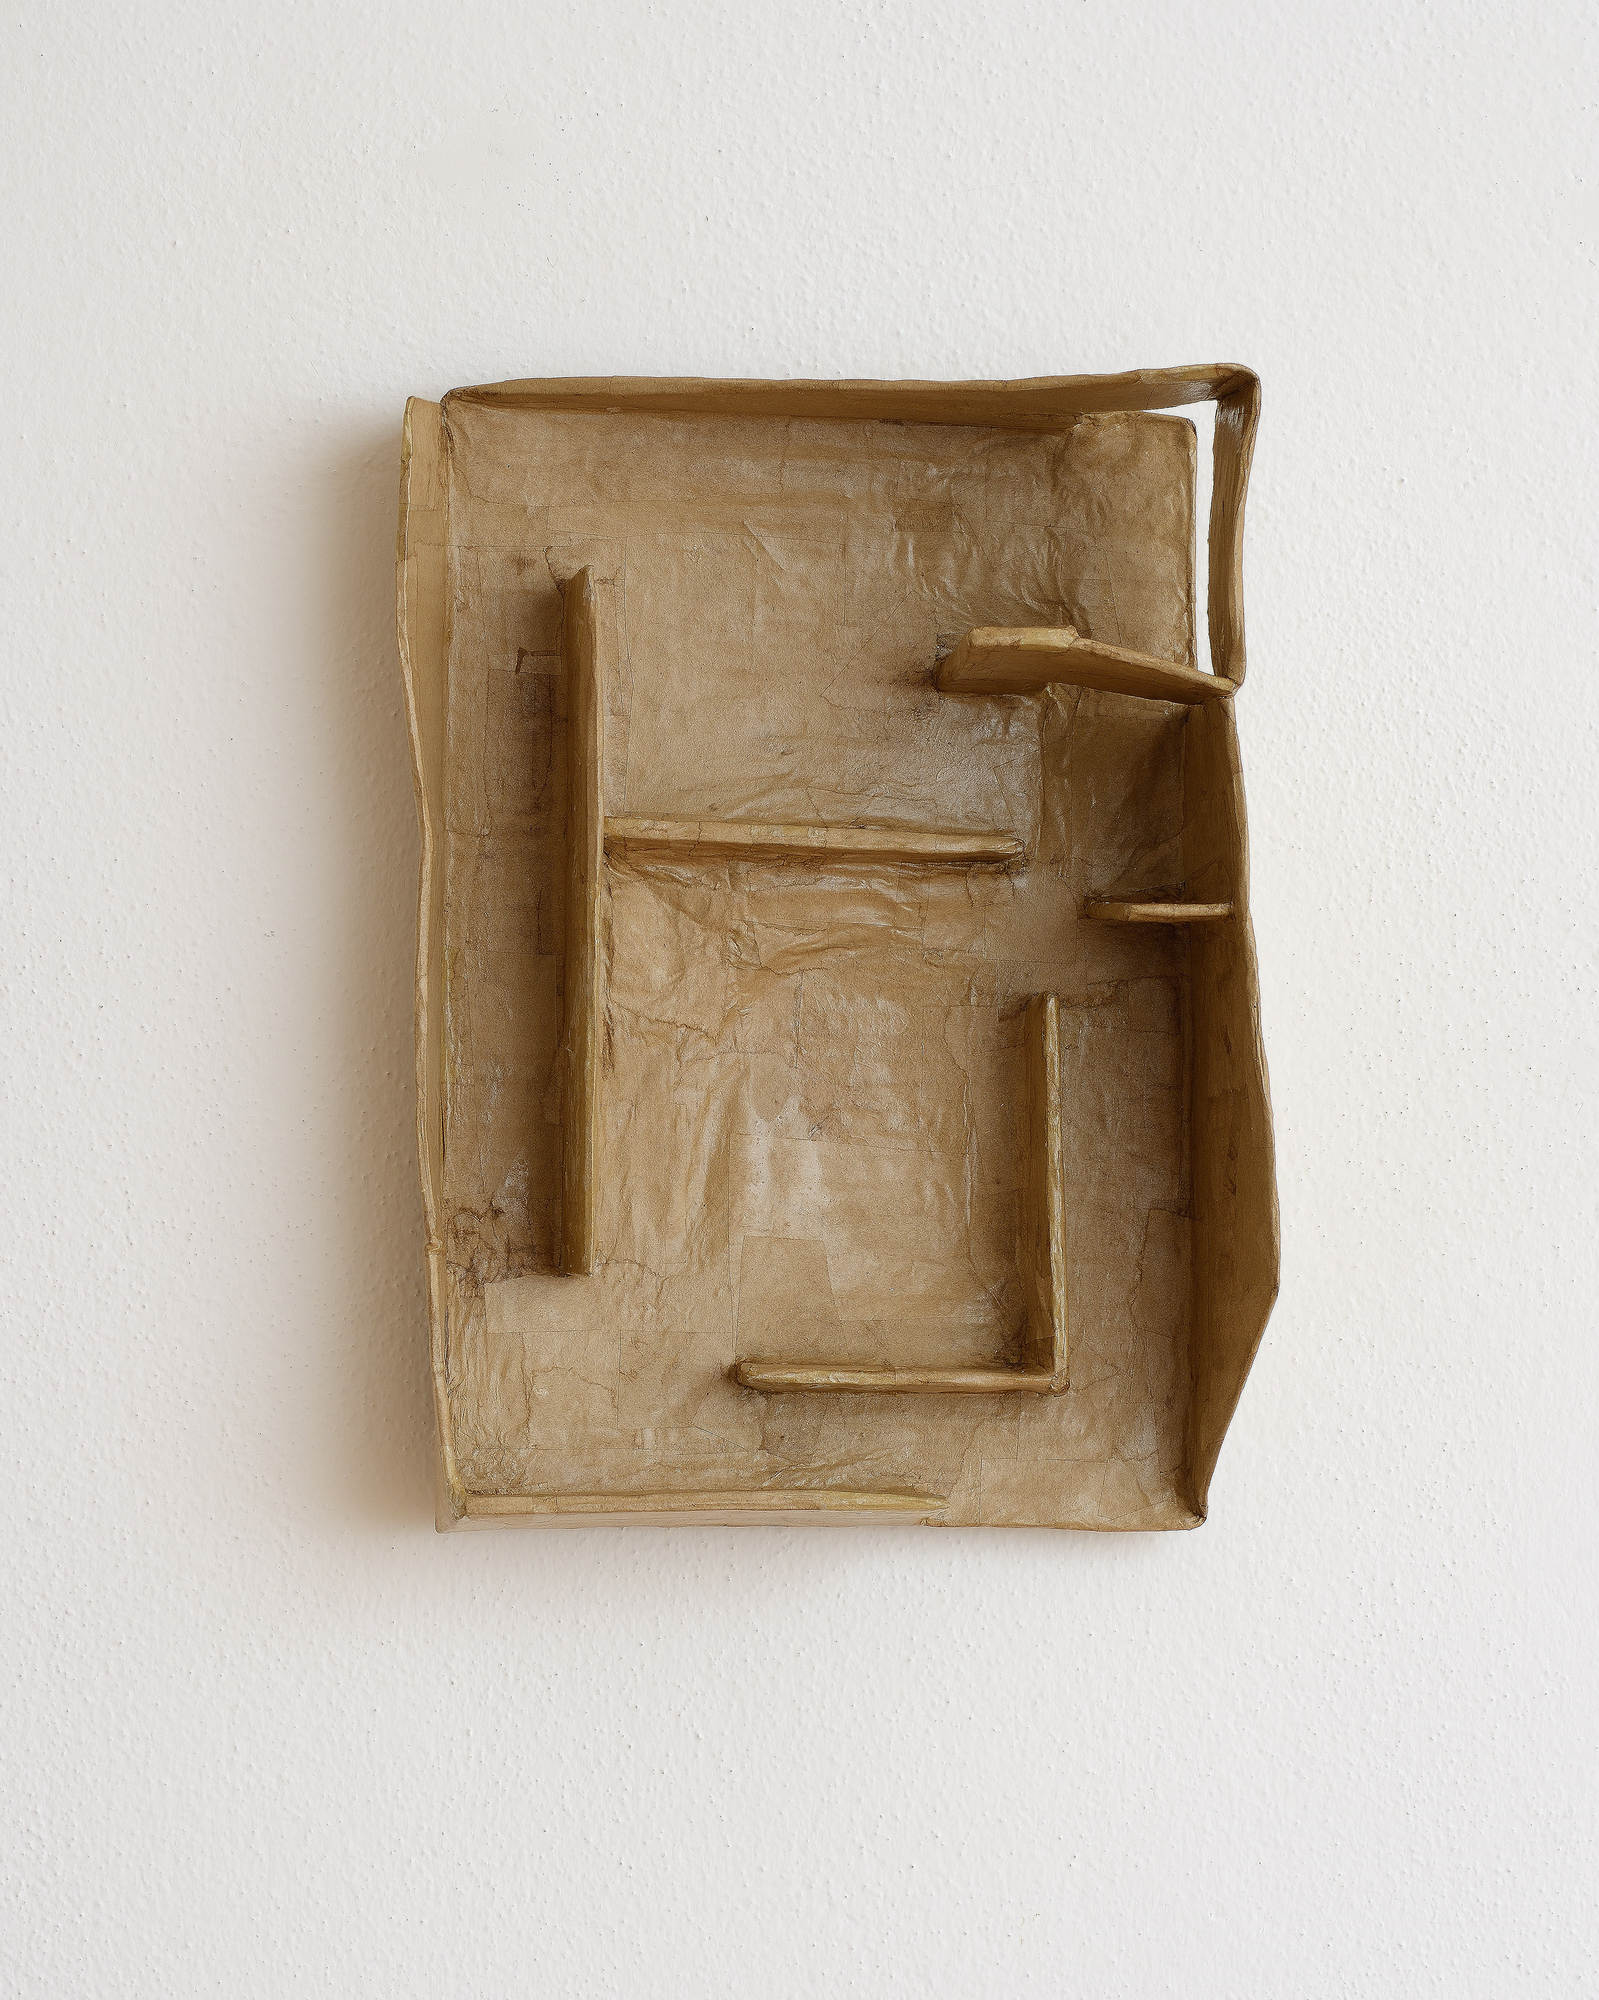 Rodrigo Hernández, Untitled, 2014